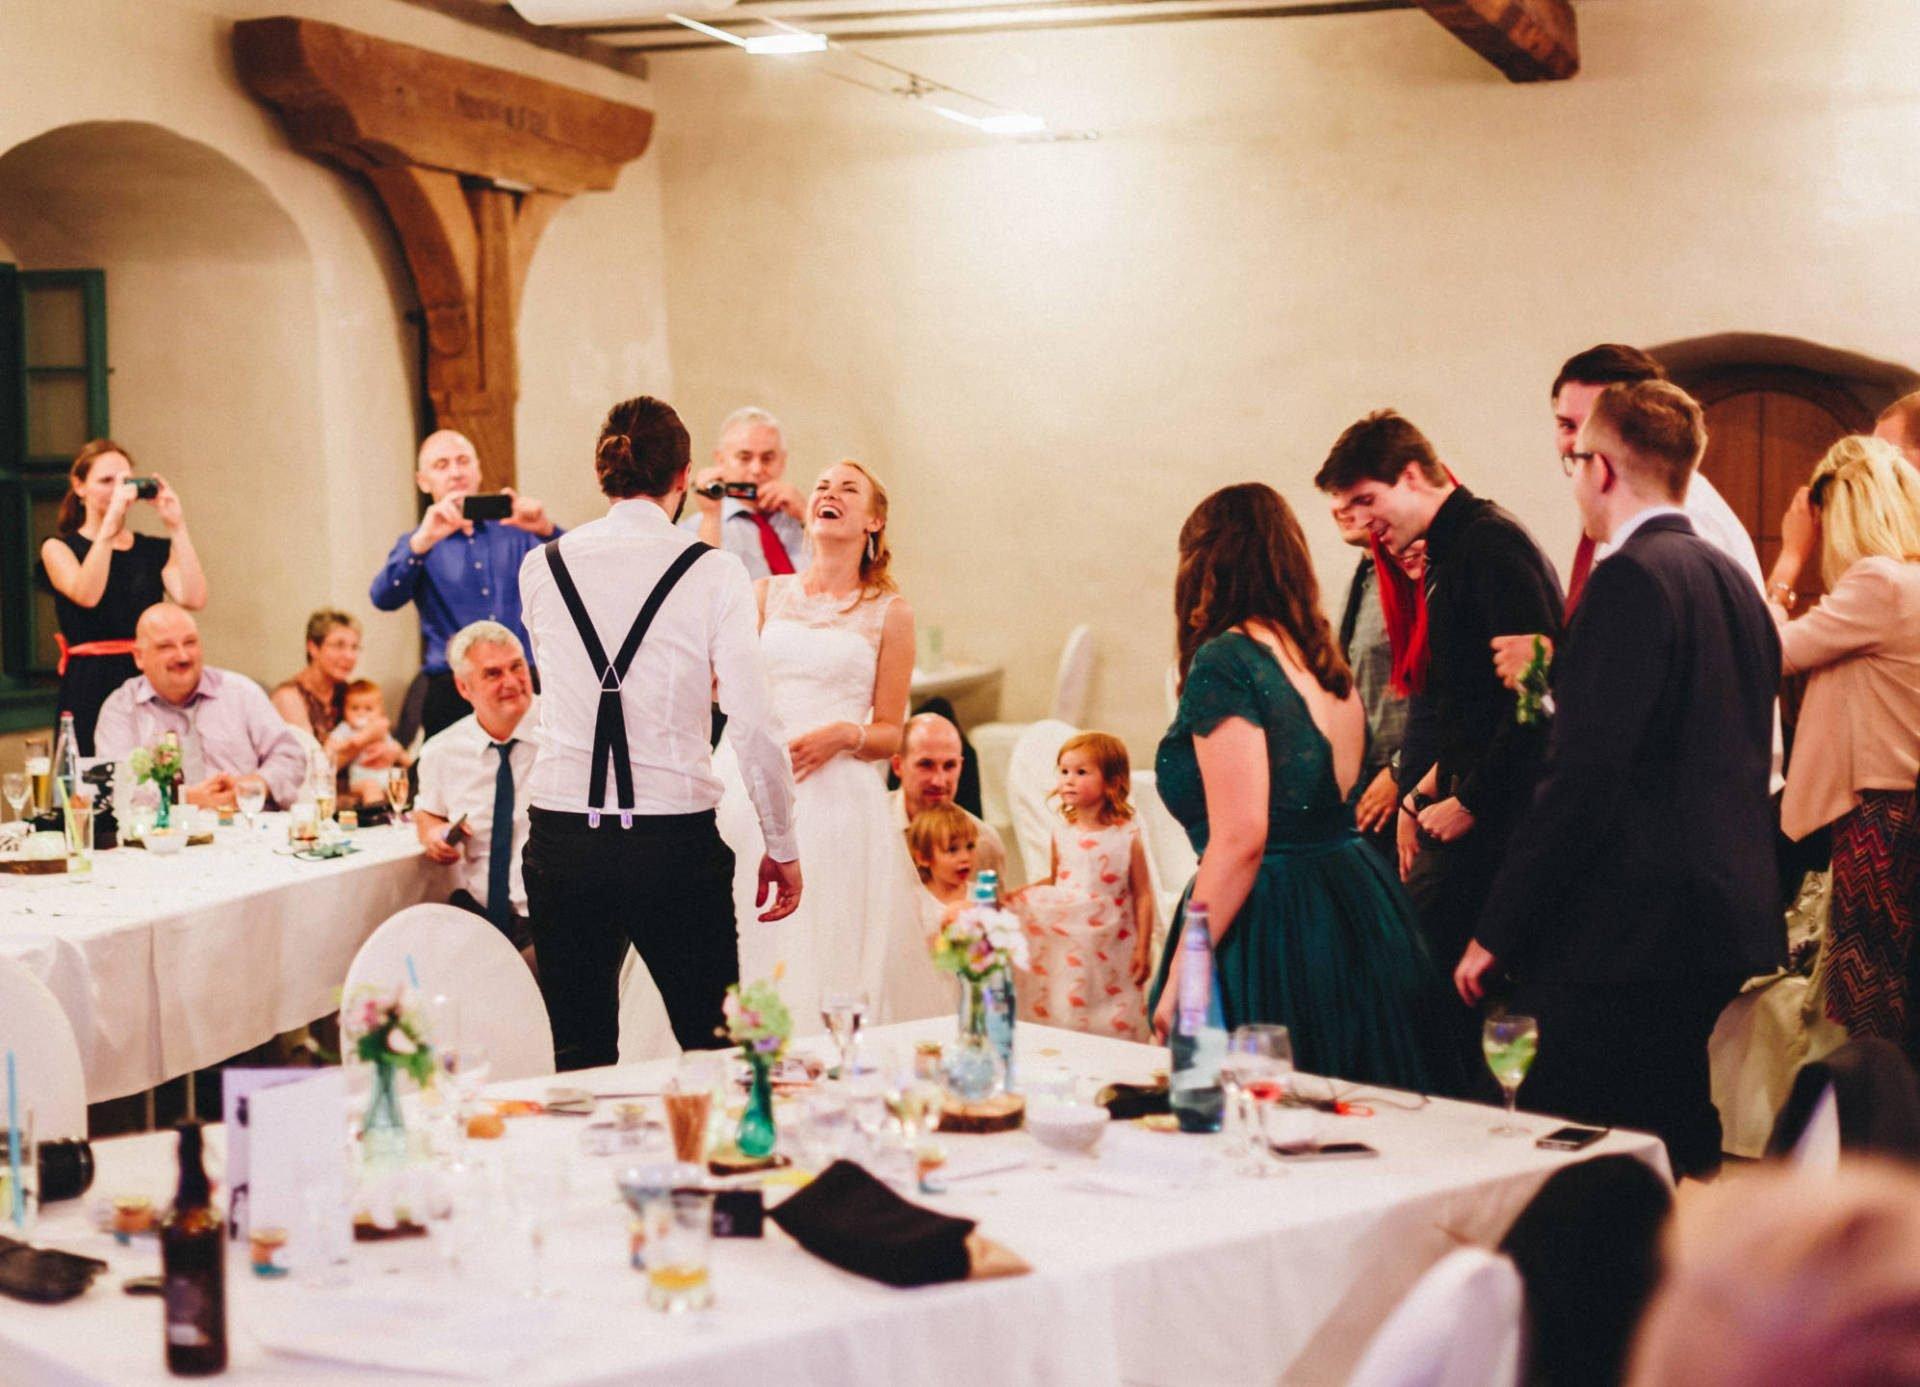 JuleSascha 62 1920x1387 - Hochzeit im alten Dornburger Schloss